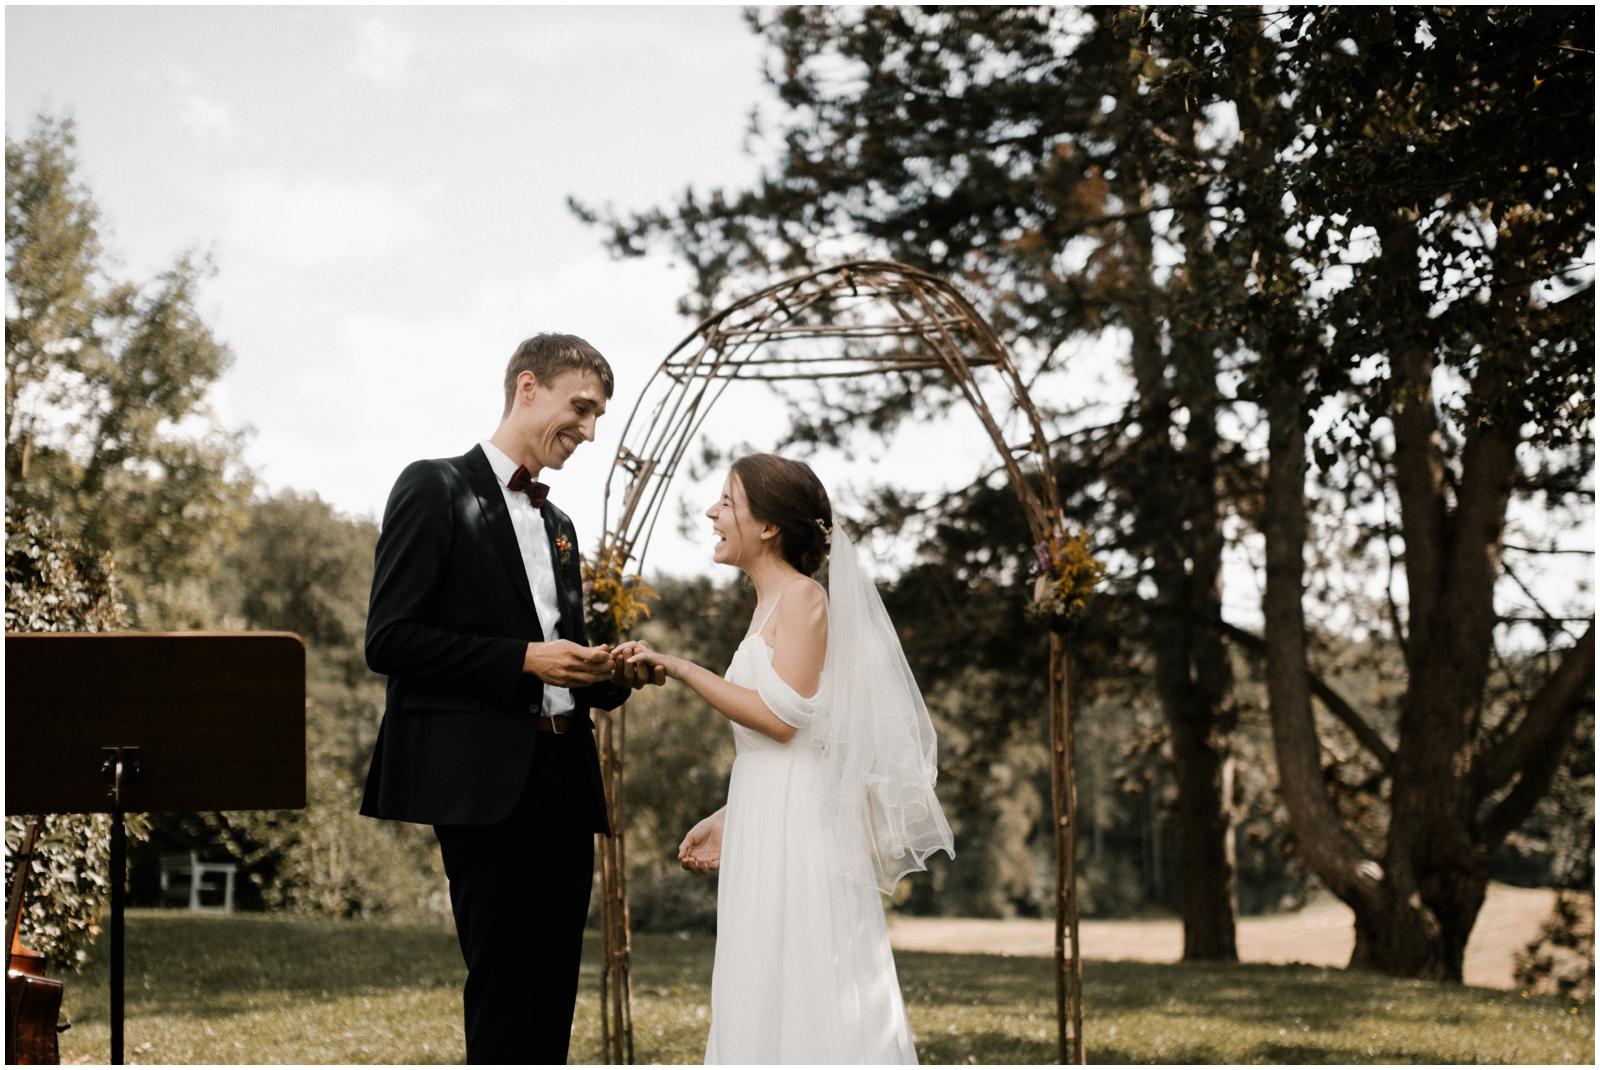 mirjam_thomas_wedding-394.jpg